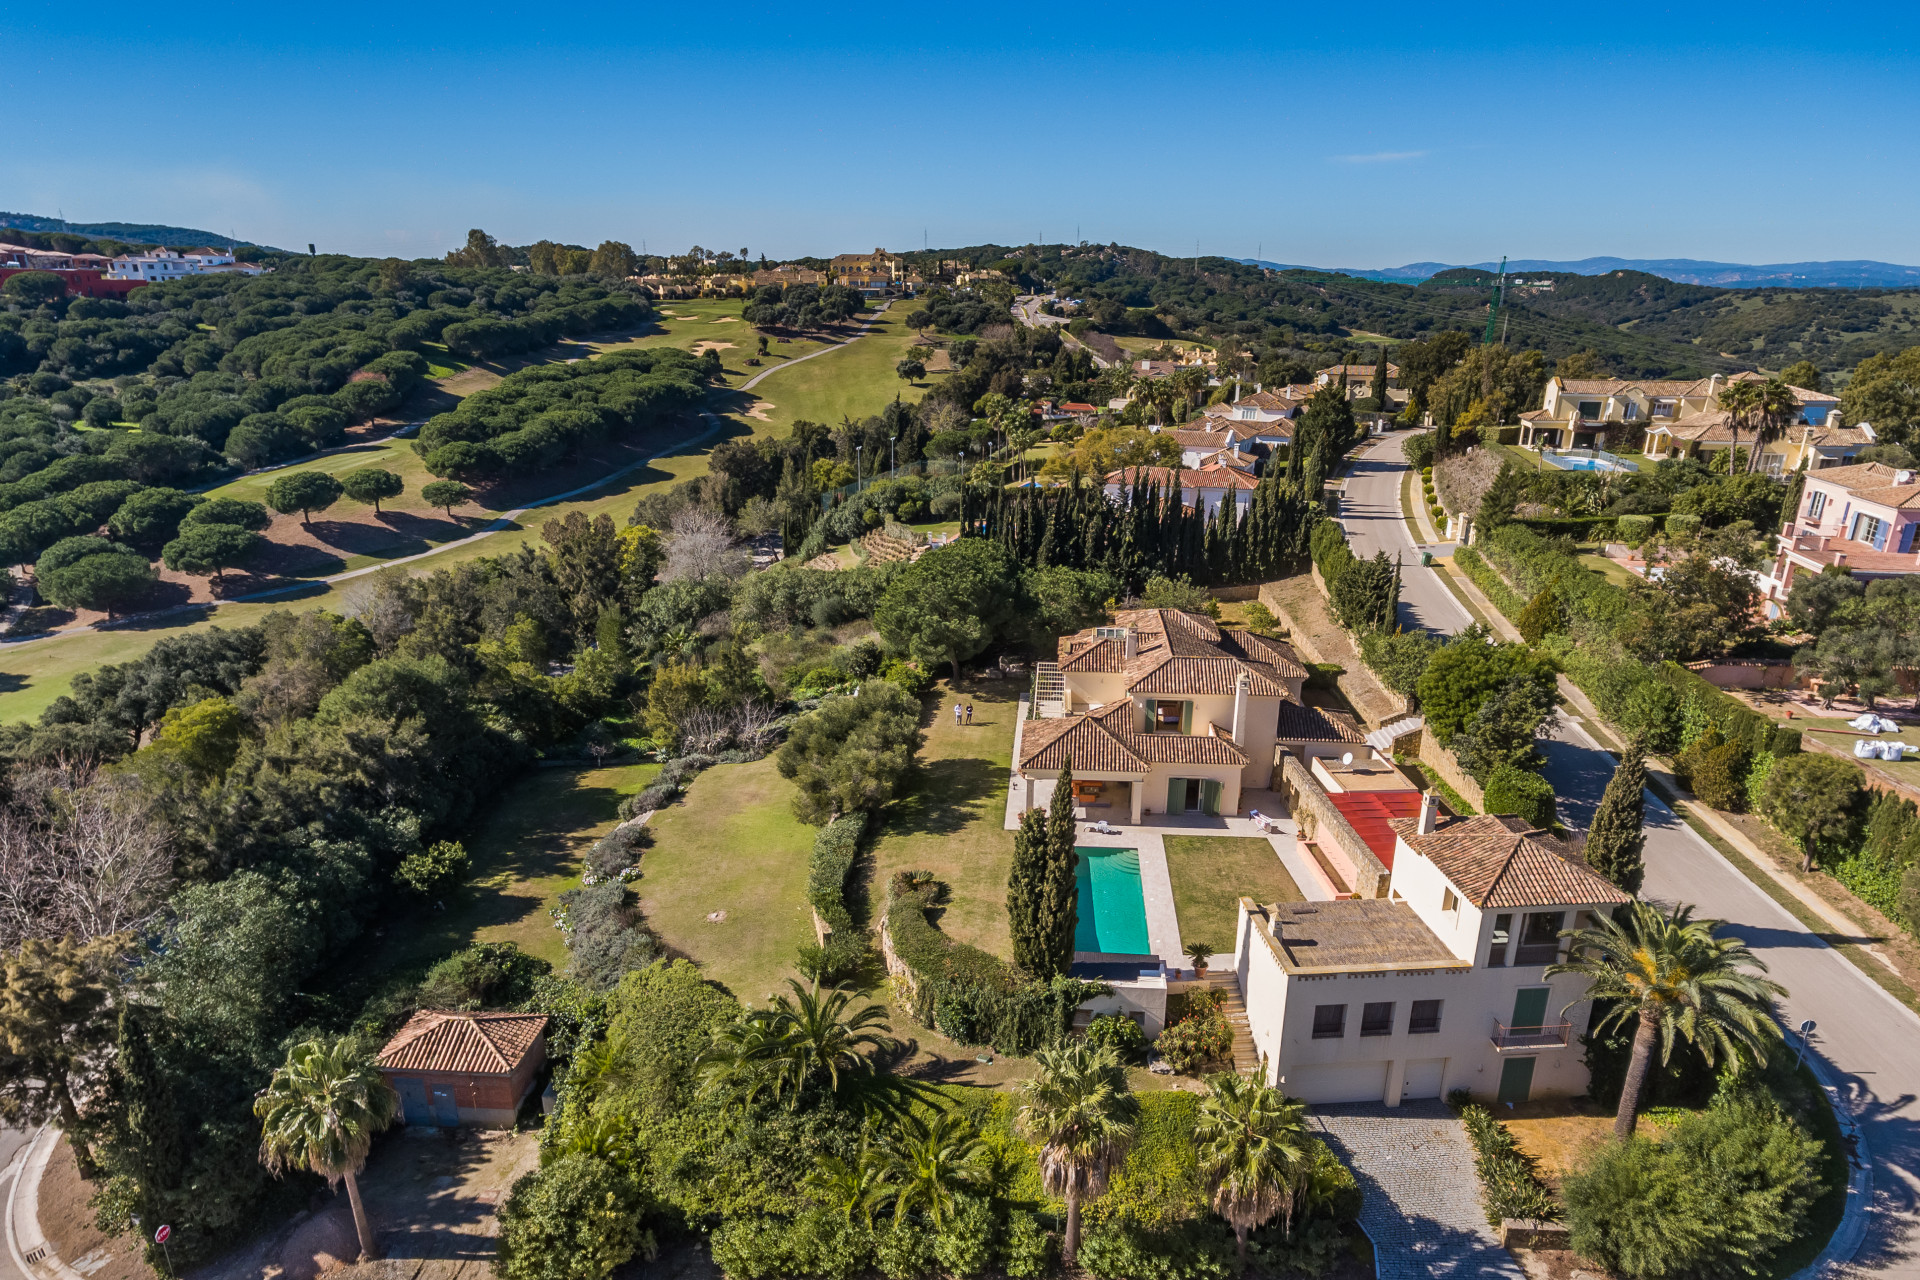 Prachtige mediterrane villa te koop in Sotogrande Alto - Sotogrande